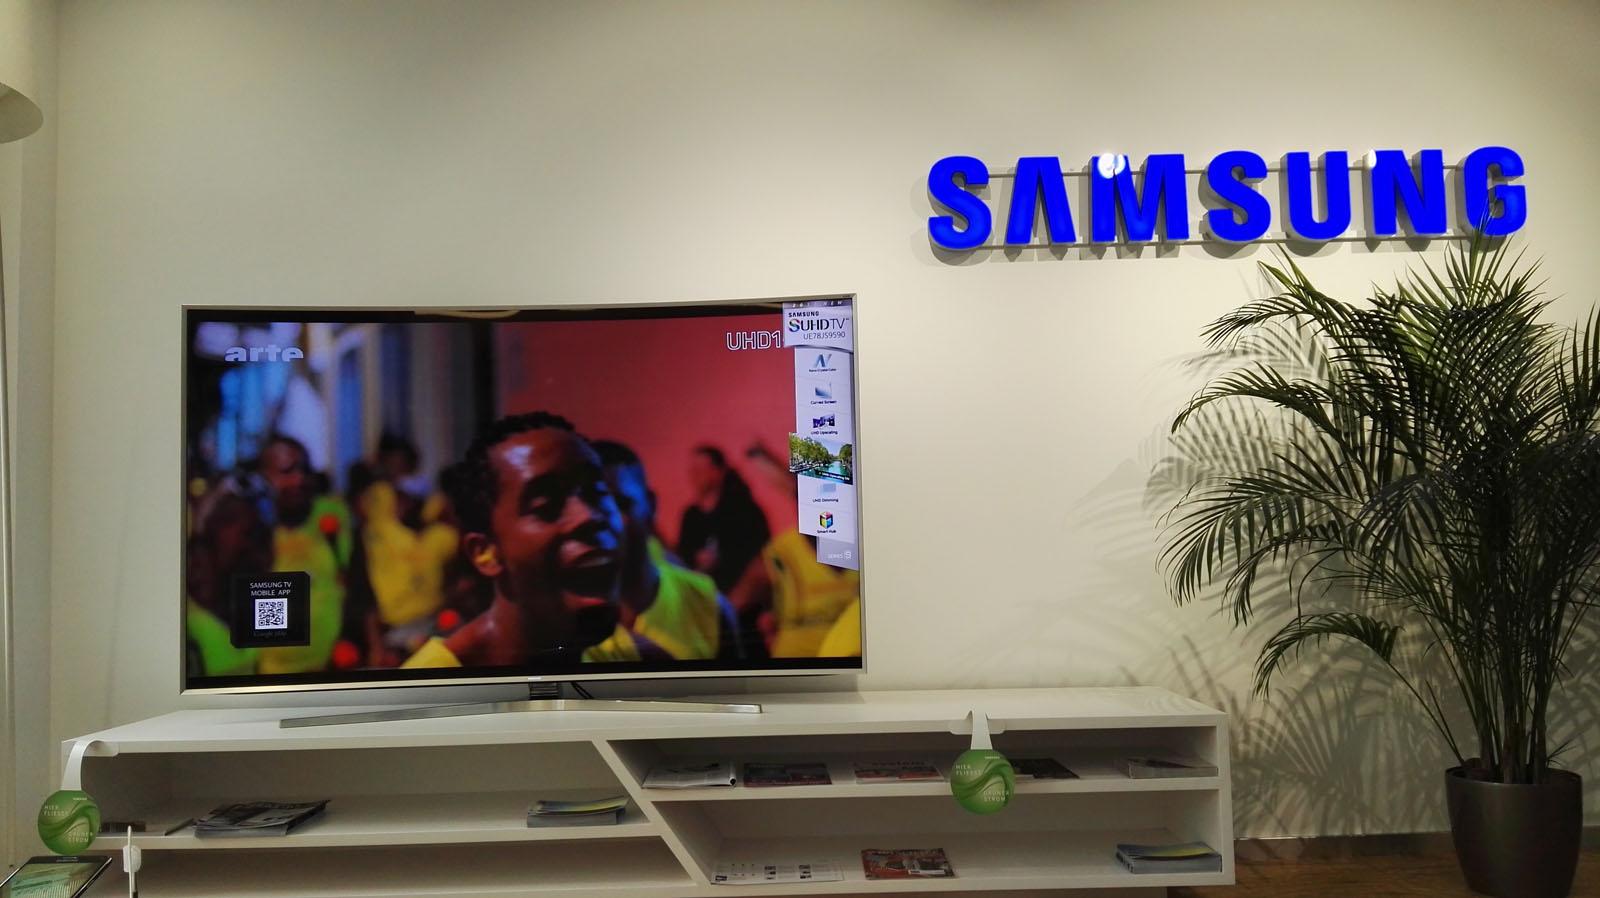 Aeg Santo Kühlschrank Anleitung Deutsch : Samsung khlschrank khlt nicht mehr. beautiful finest digital lcd